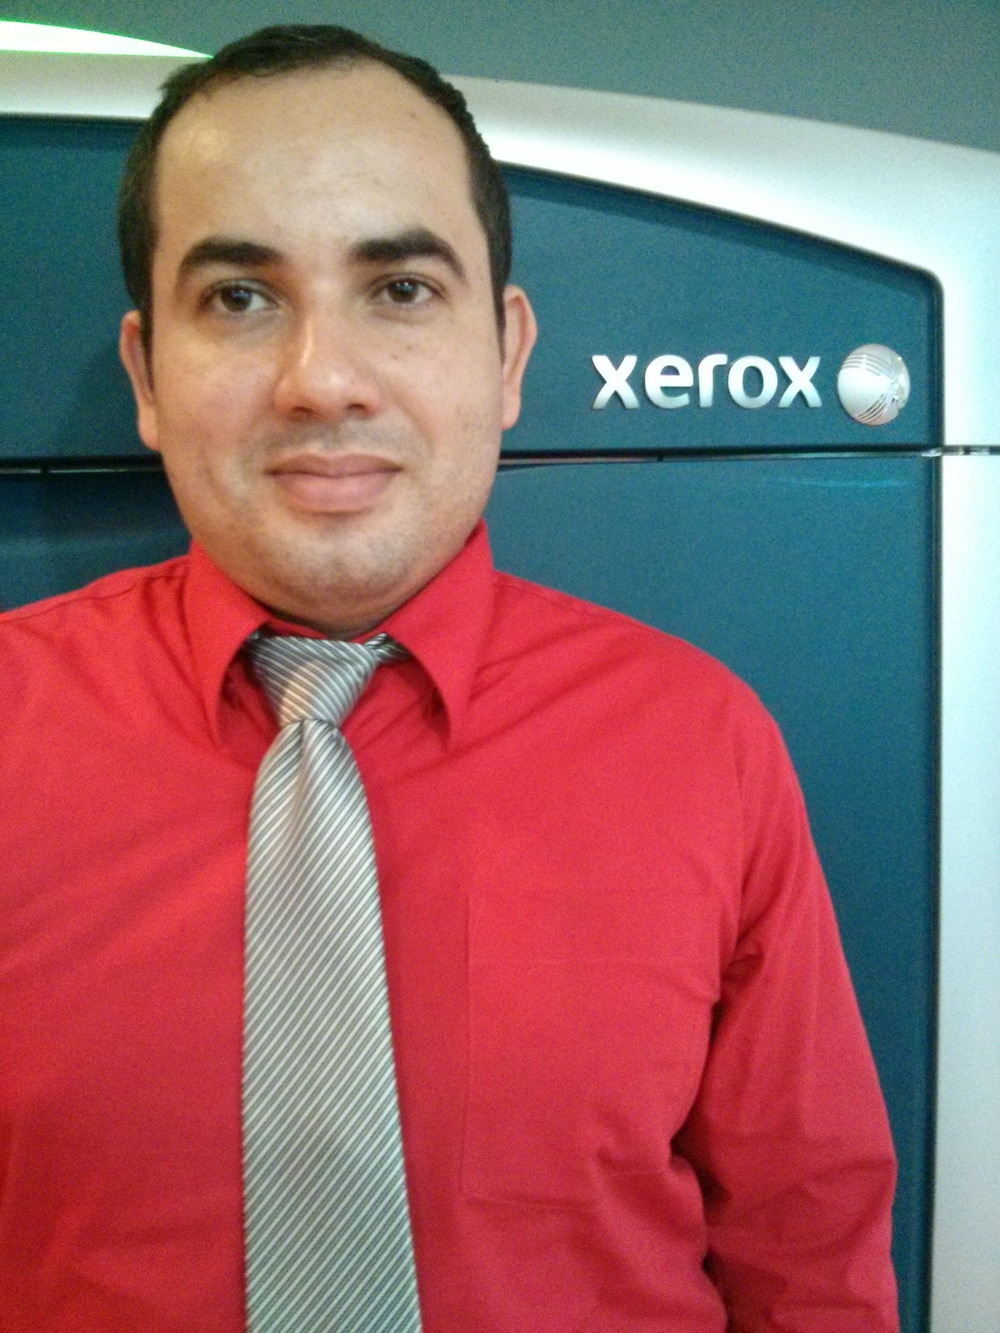 Expositor: Esteban Corrales, Especialista de producto Xerox